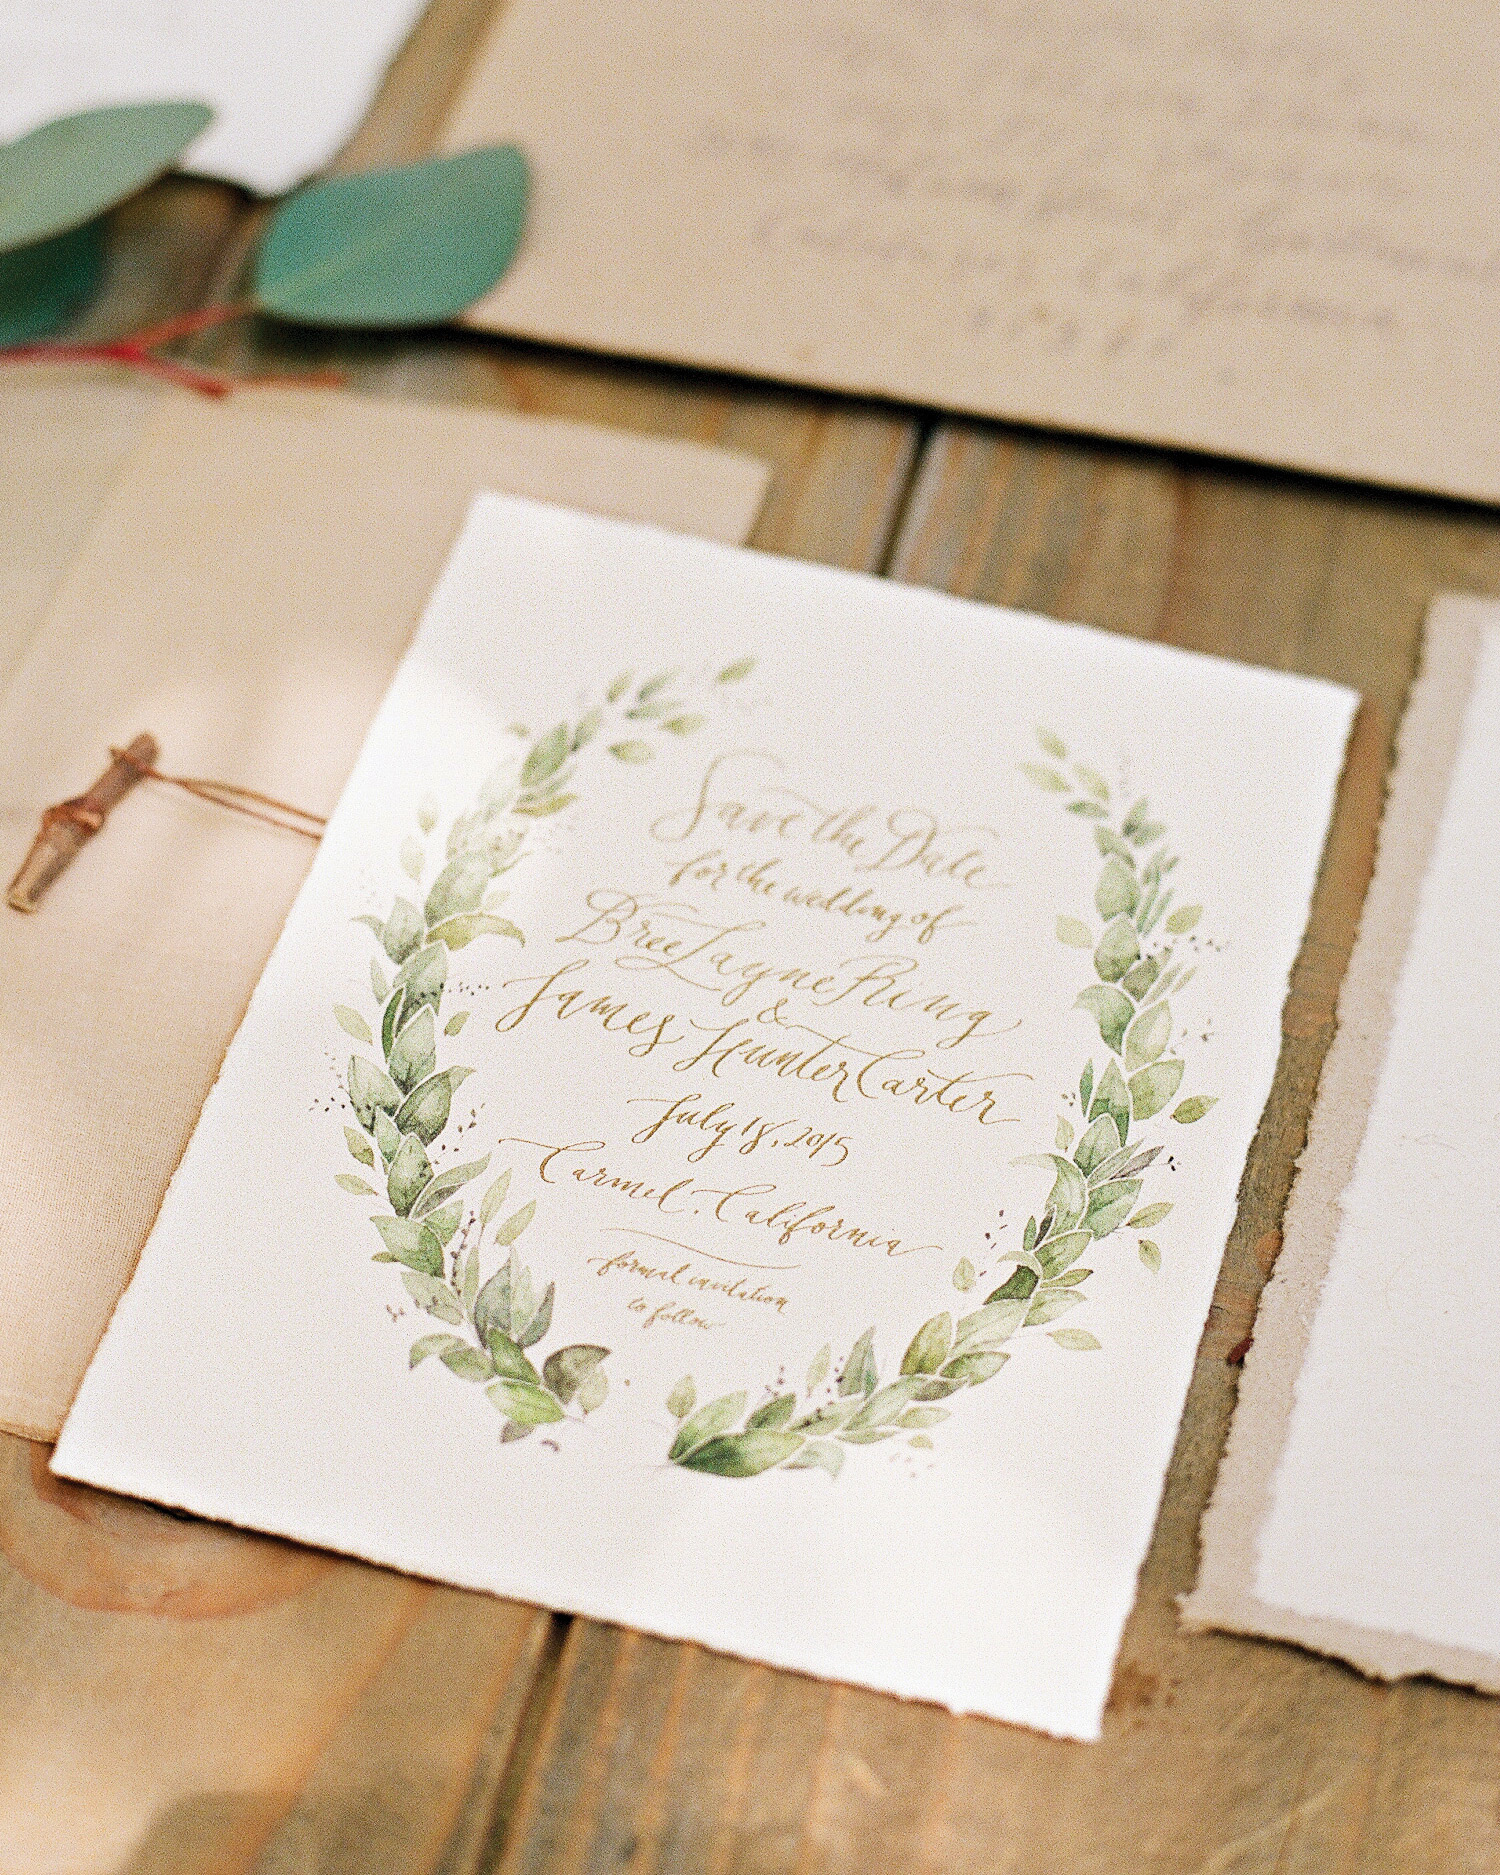 breelayne-hunter-wedding-california-save-the-dates-0006-s112849.jpg